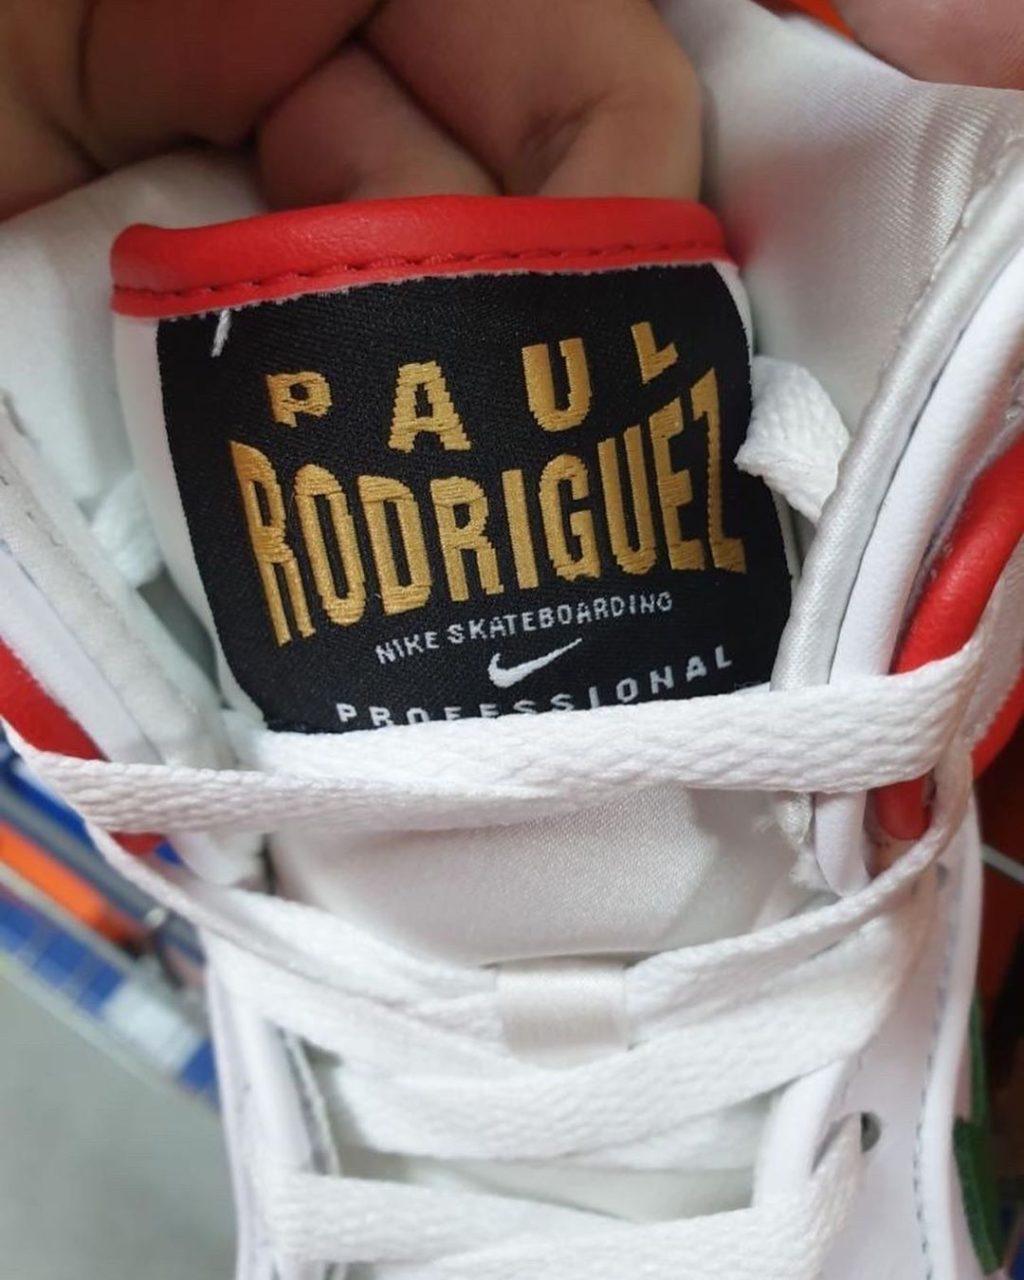 paul-rodriguez-nike-sb-dunk-high-release-2020